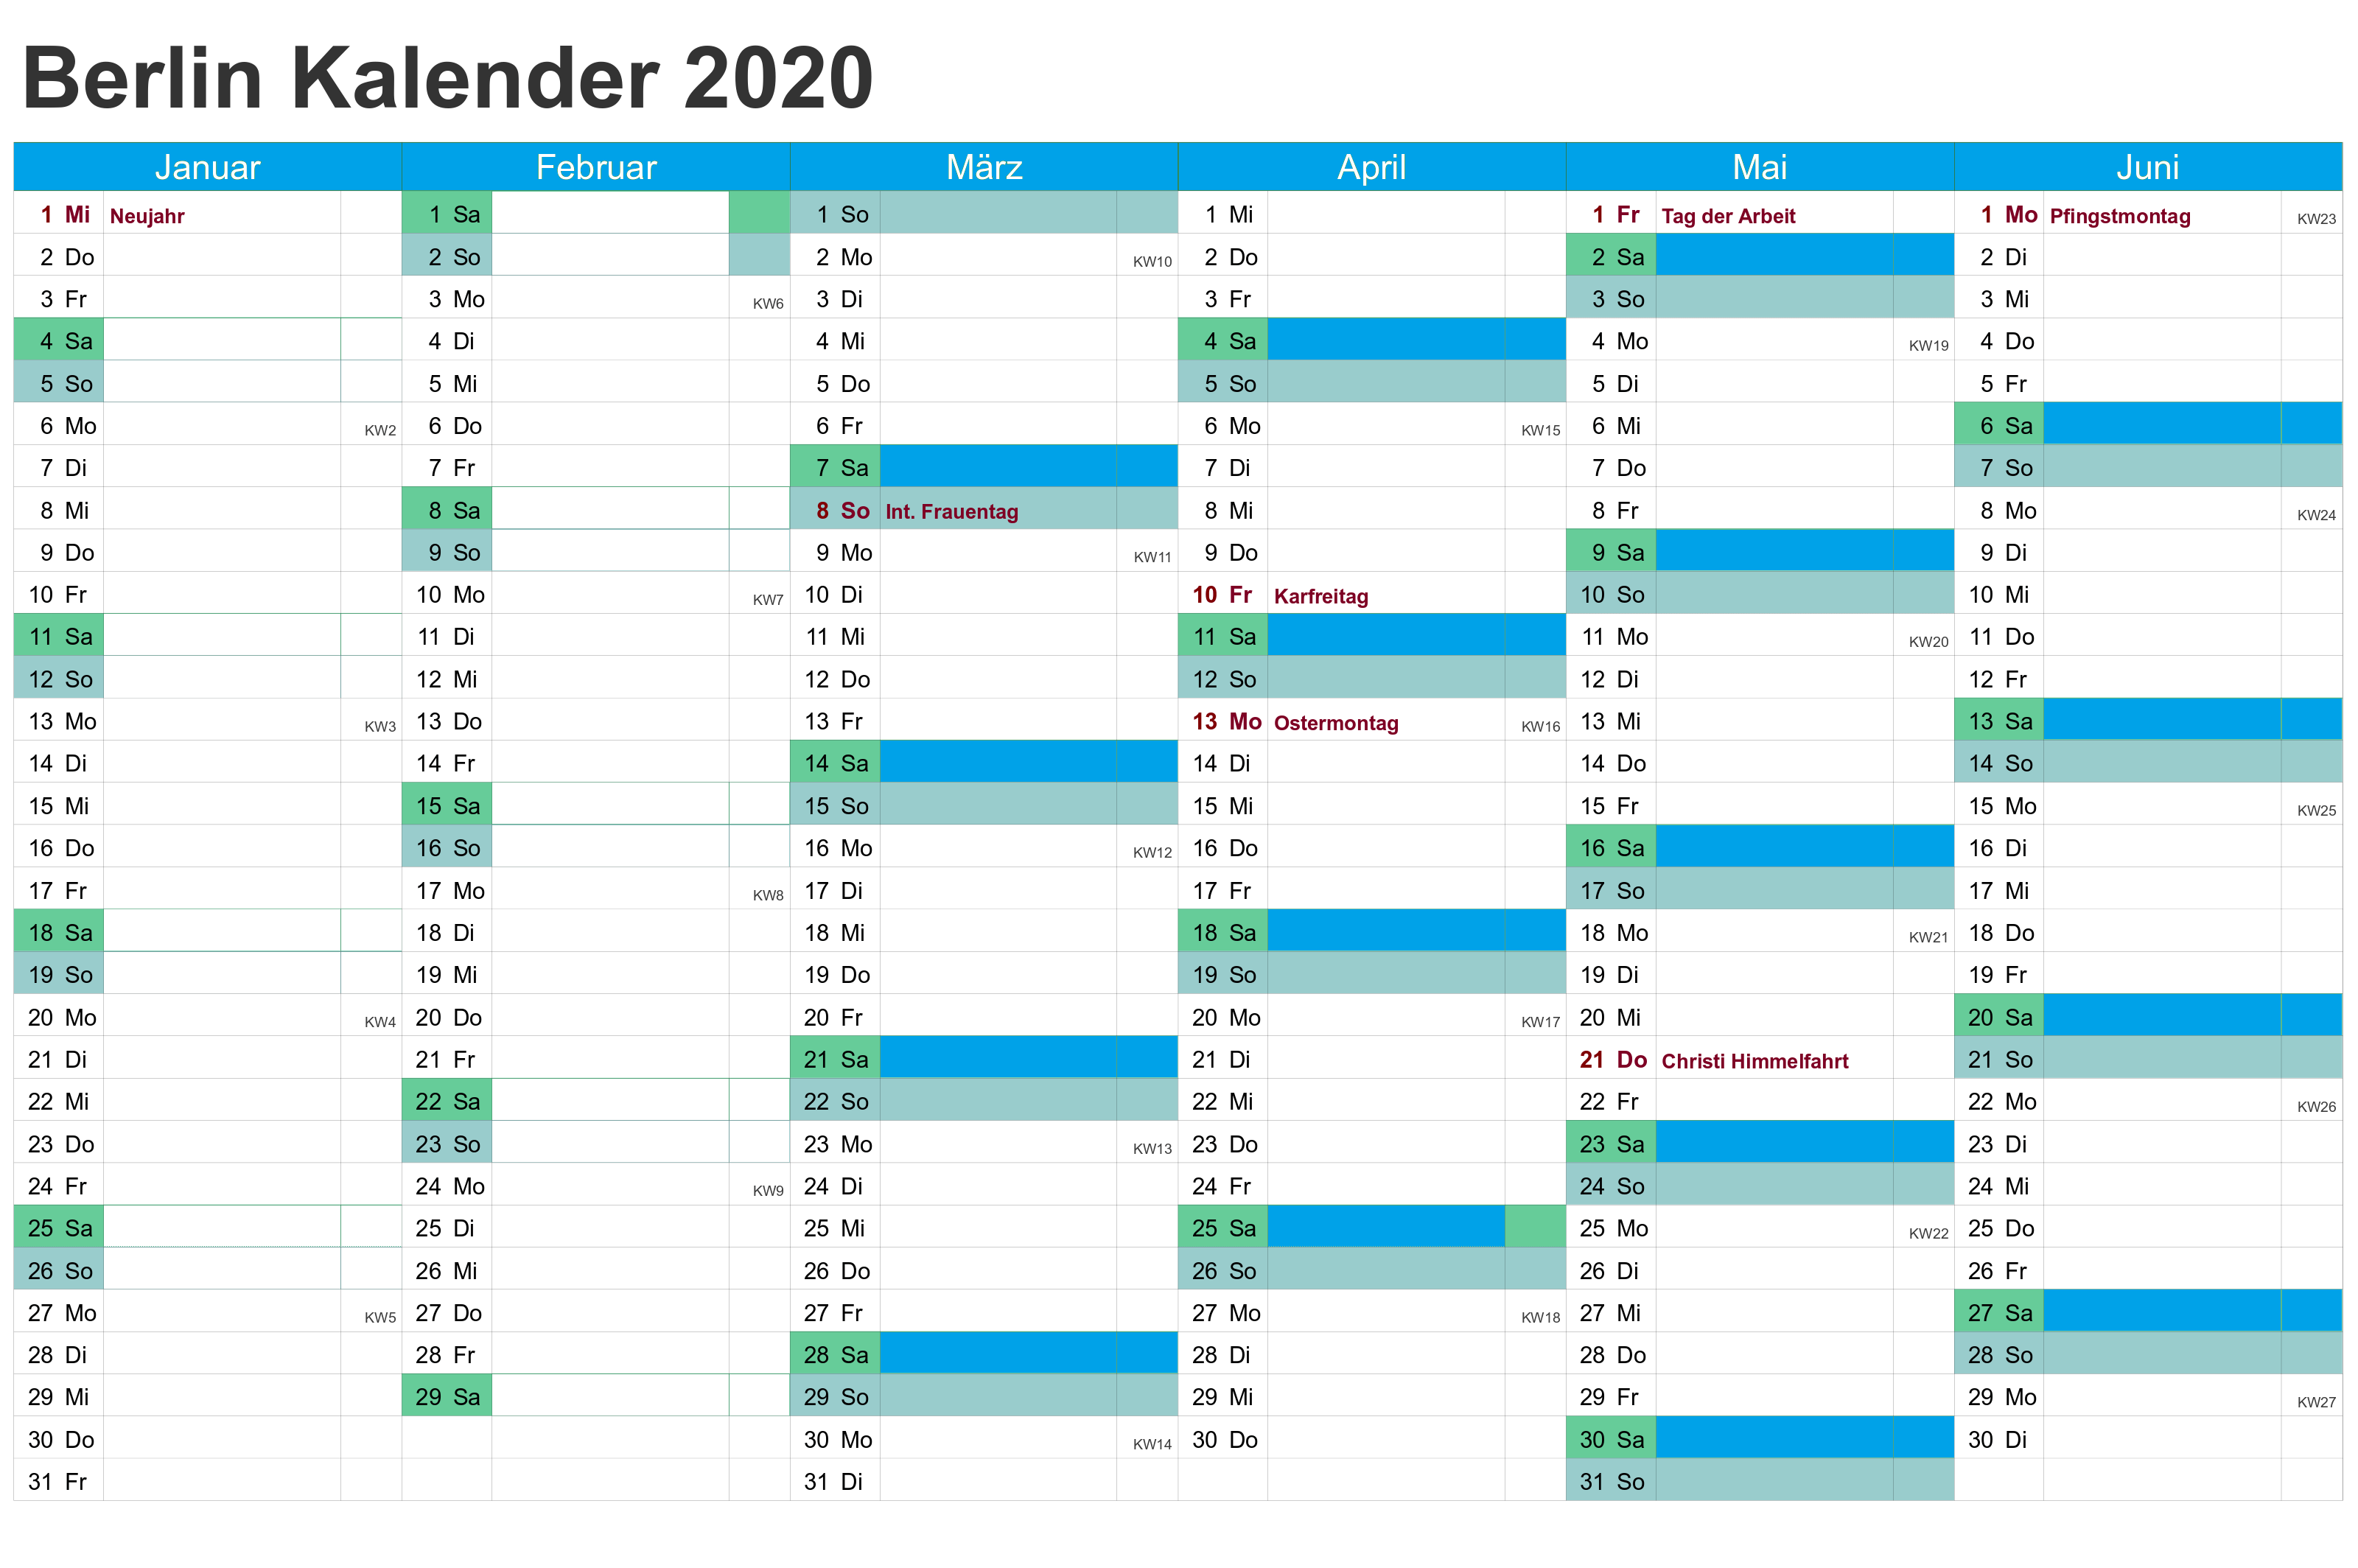 Kalender Berlin 2020 Zum Ausdrucken